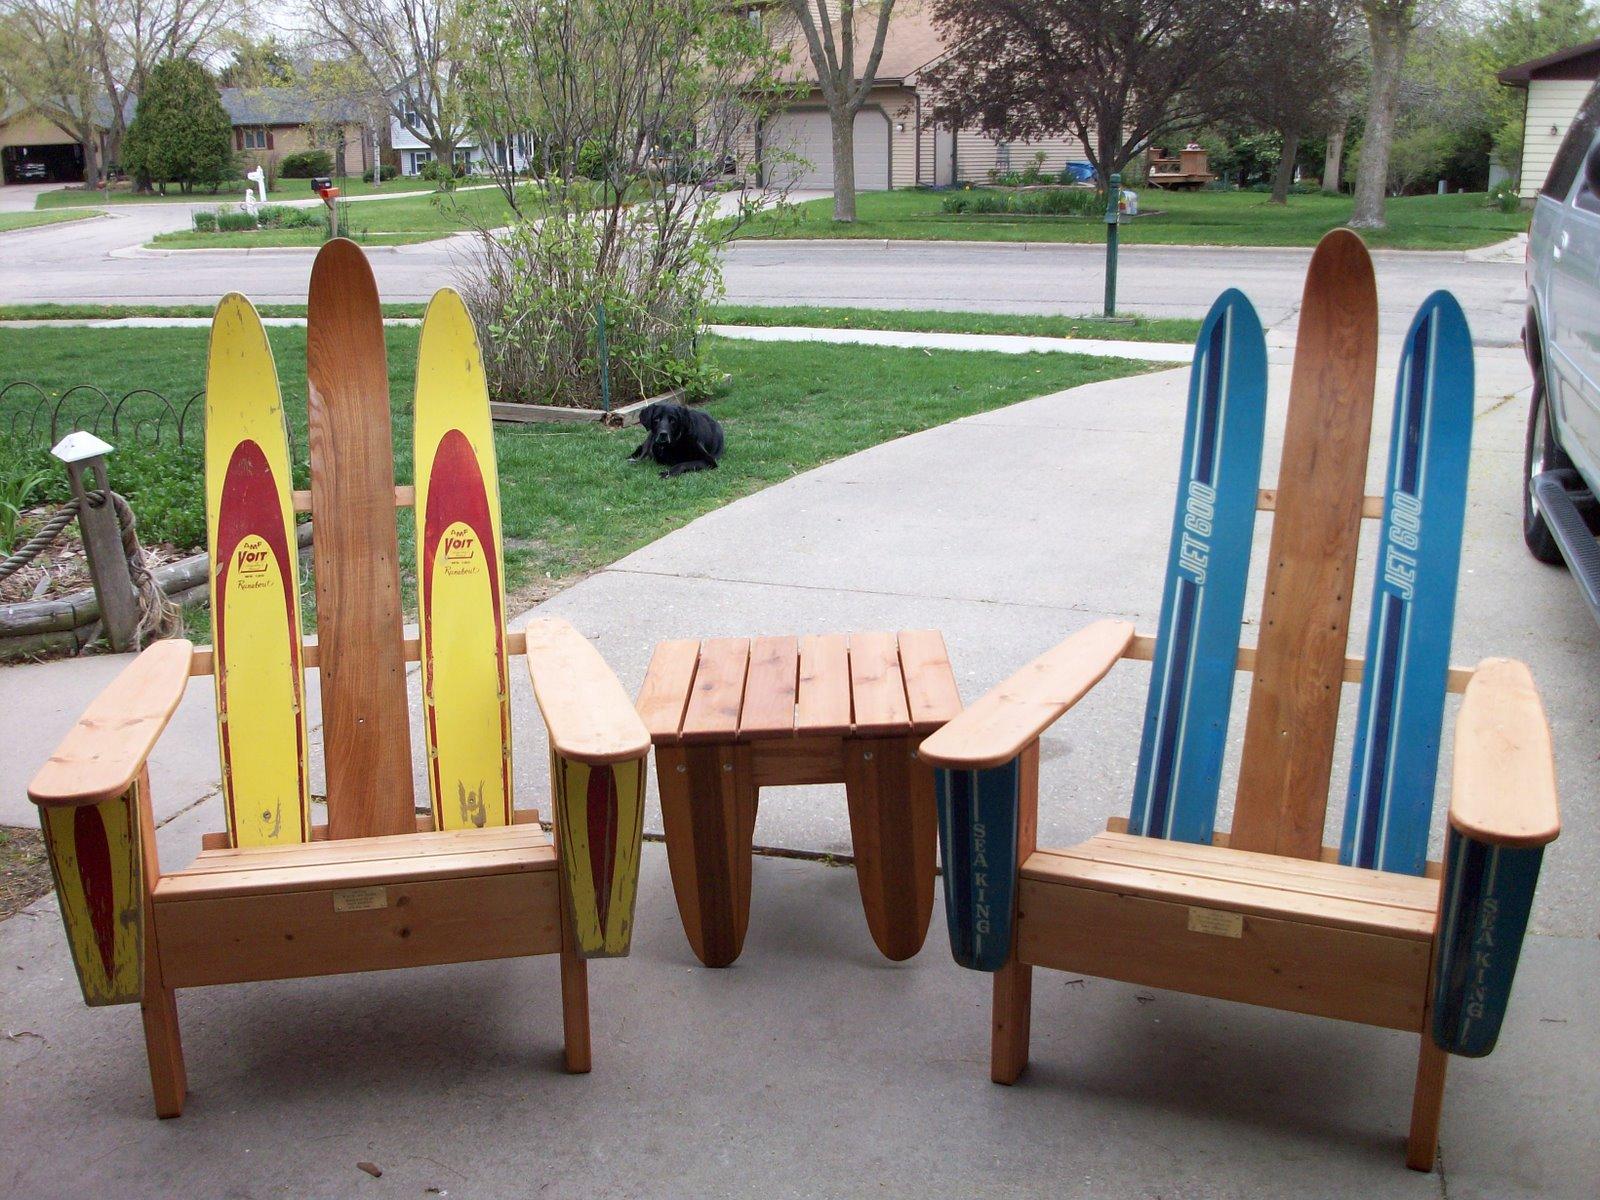 Water Ski Chair & Sure: Adirondack chair plans snow skis